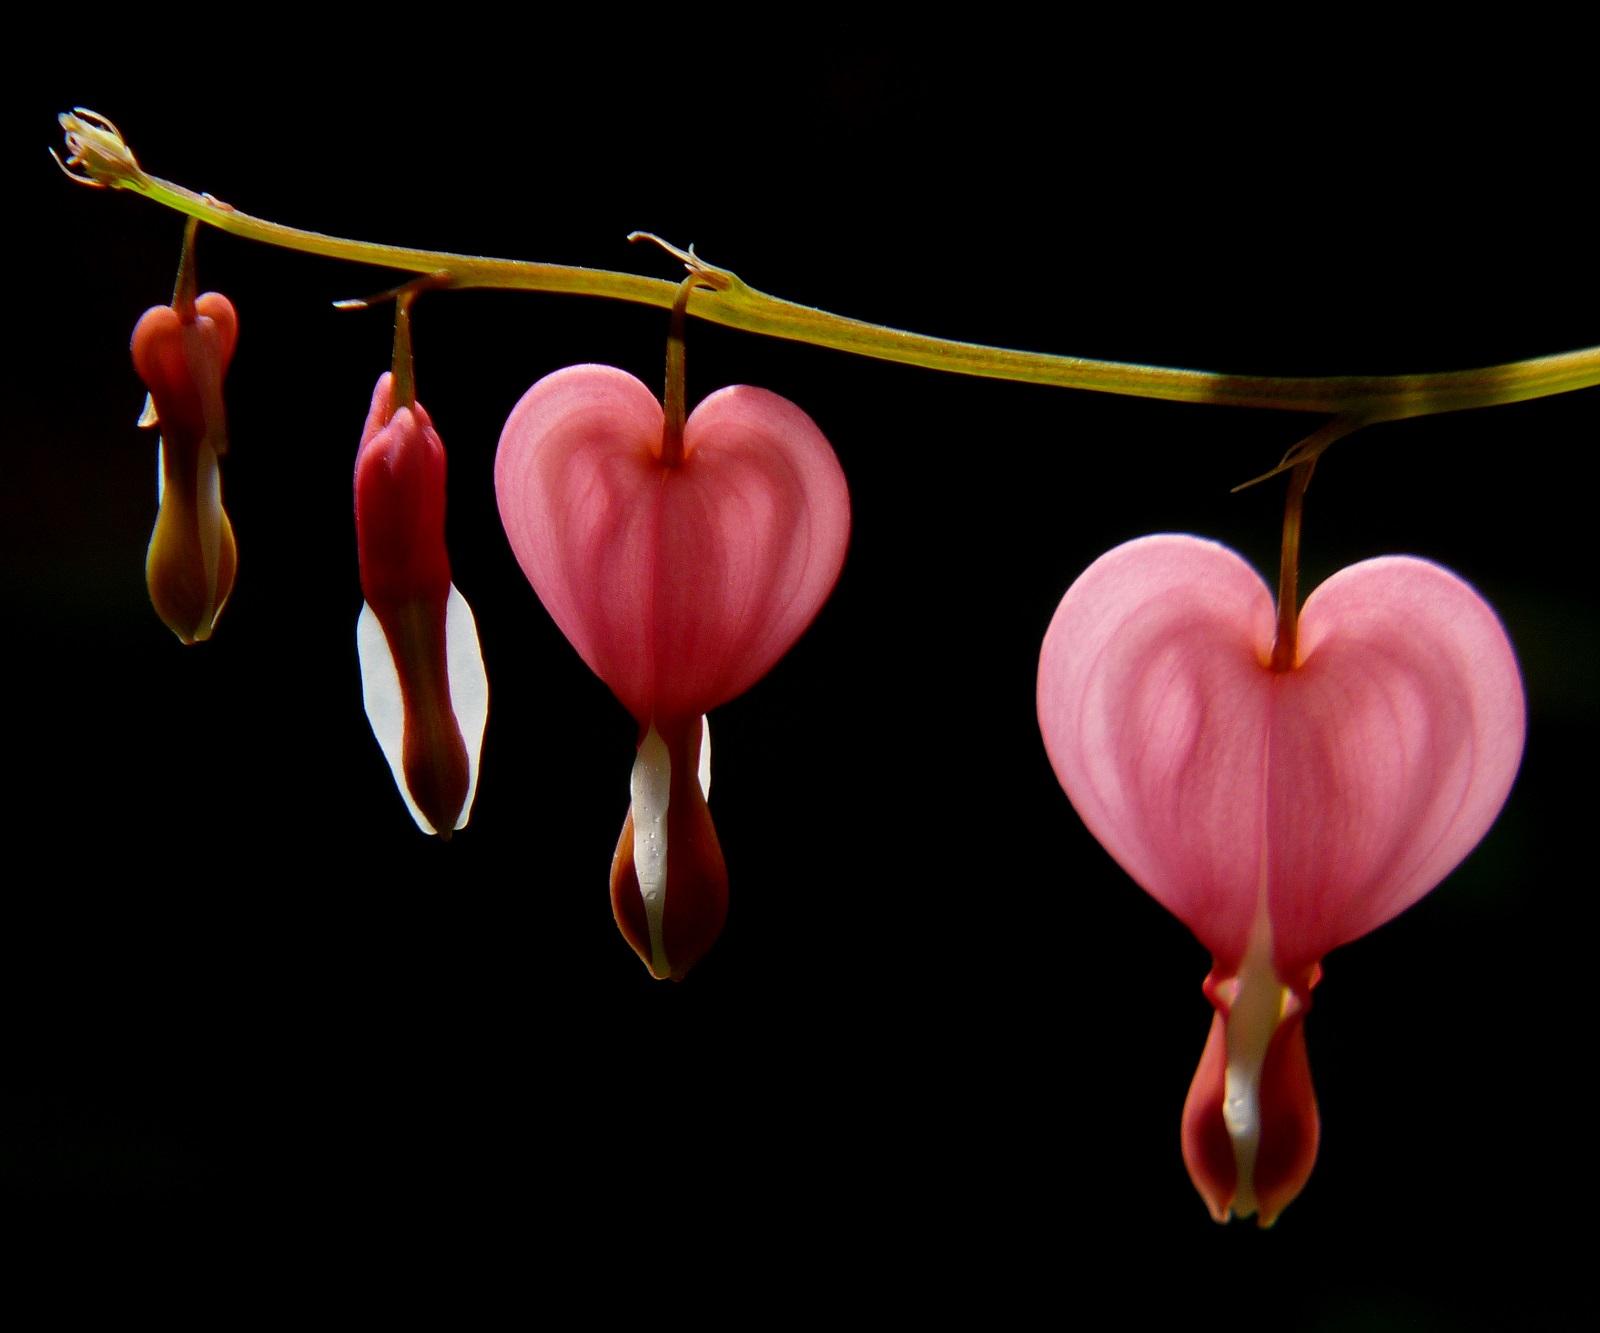 Real Monstrosities: Bleeding Heart